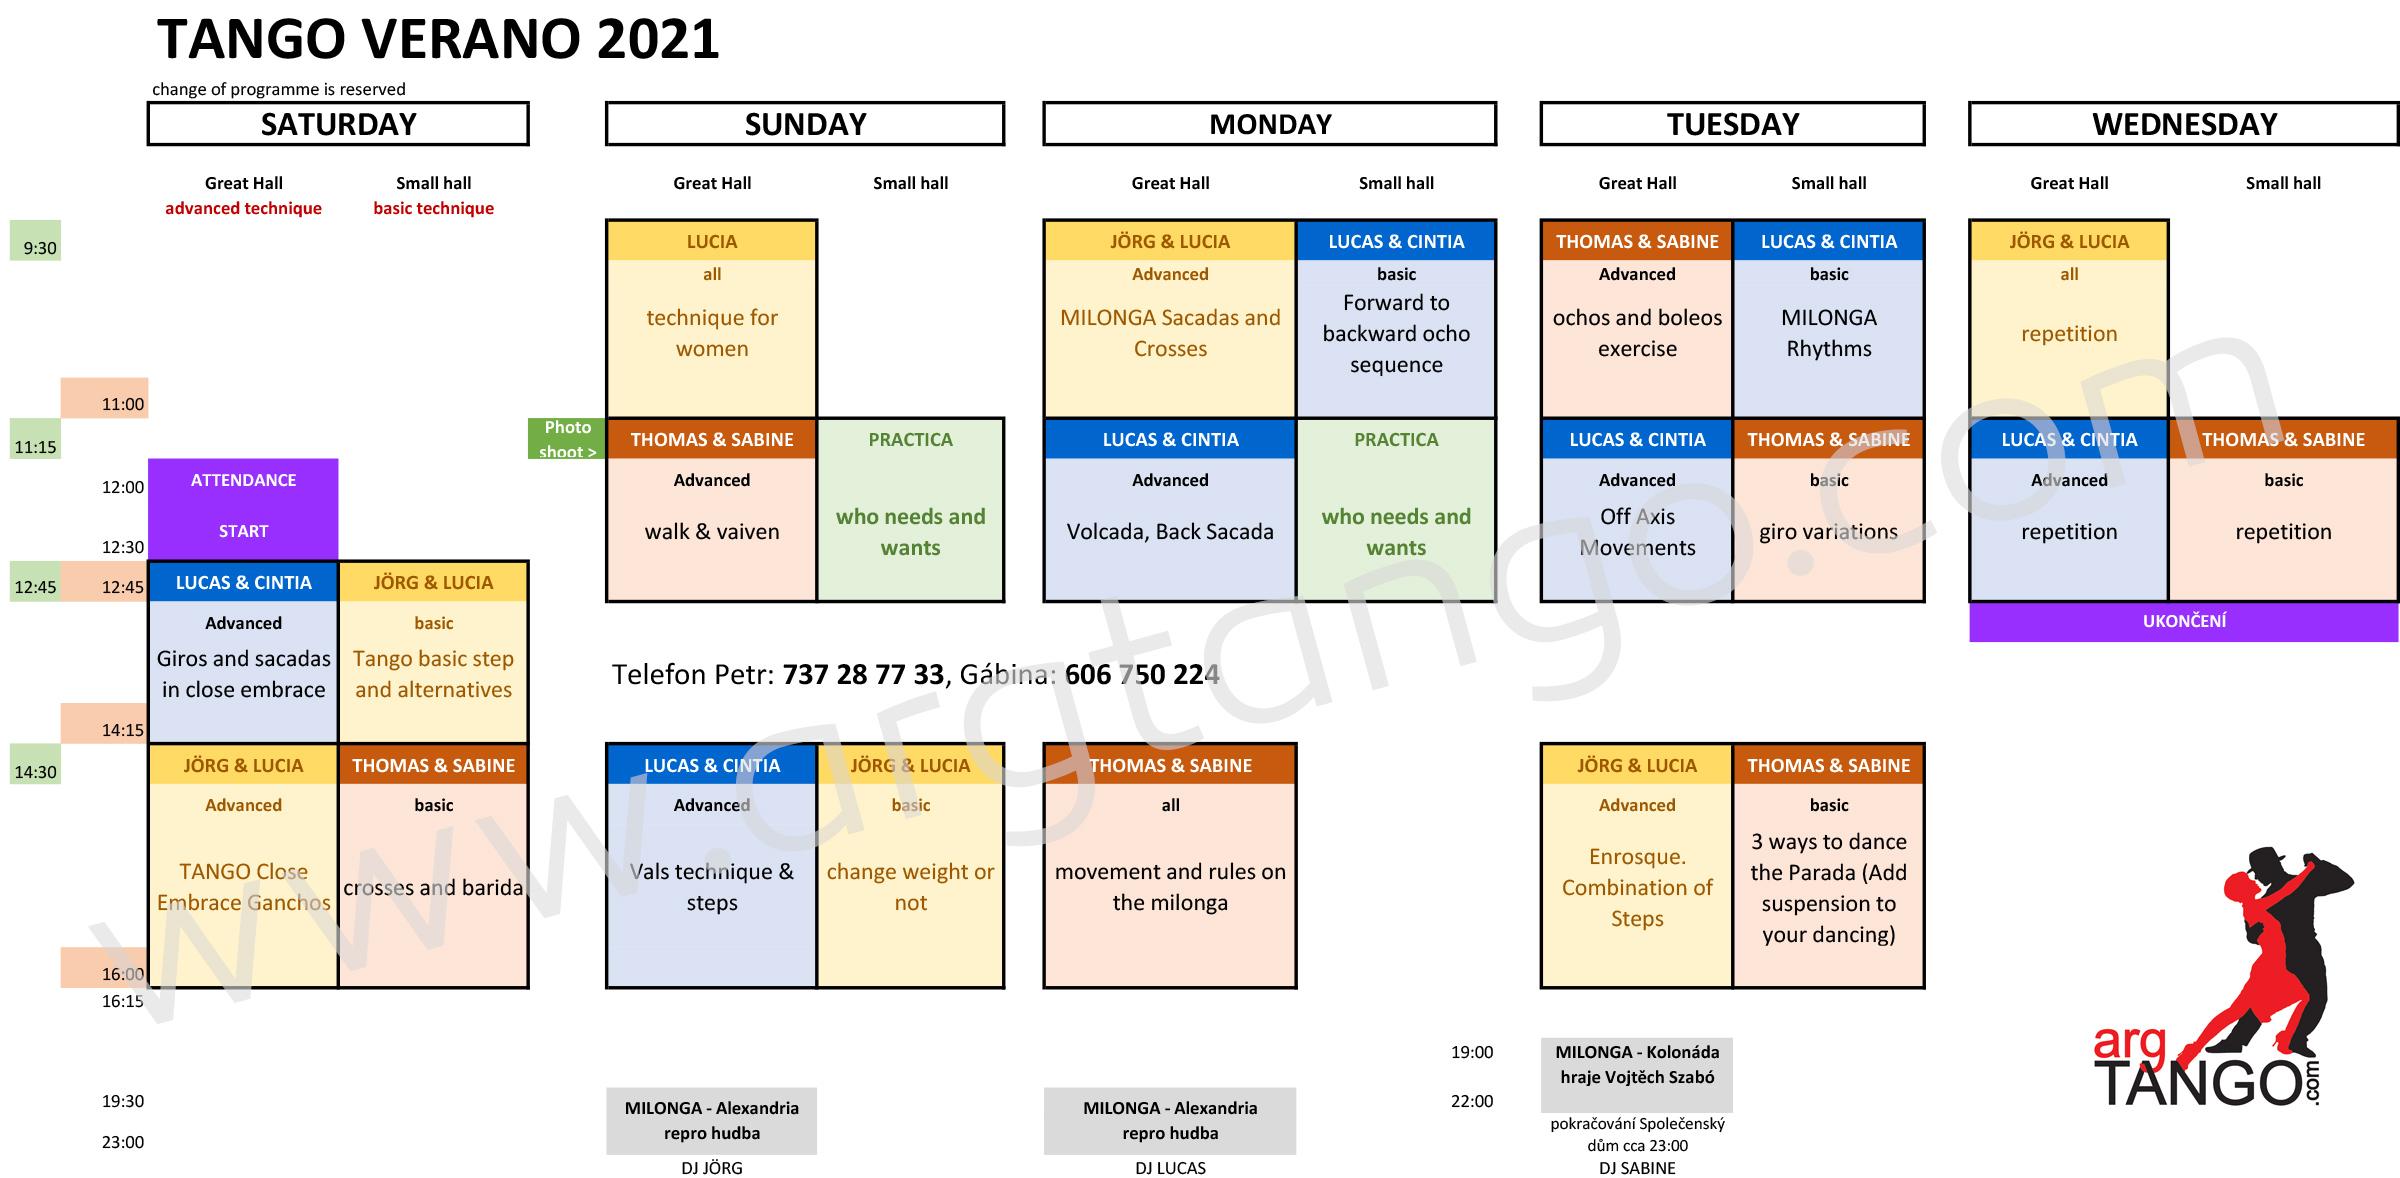 Tango Verano 2021 program